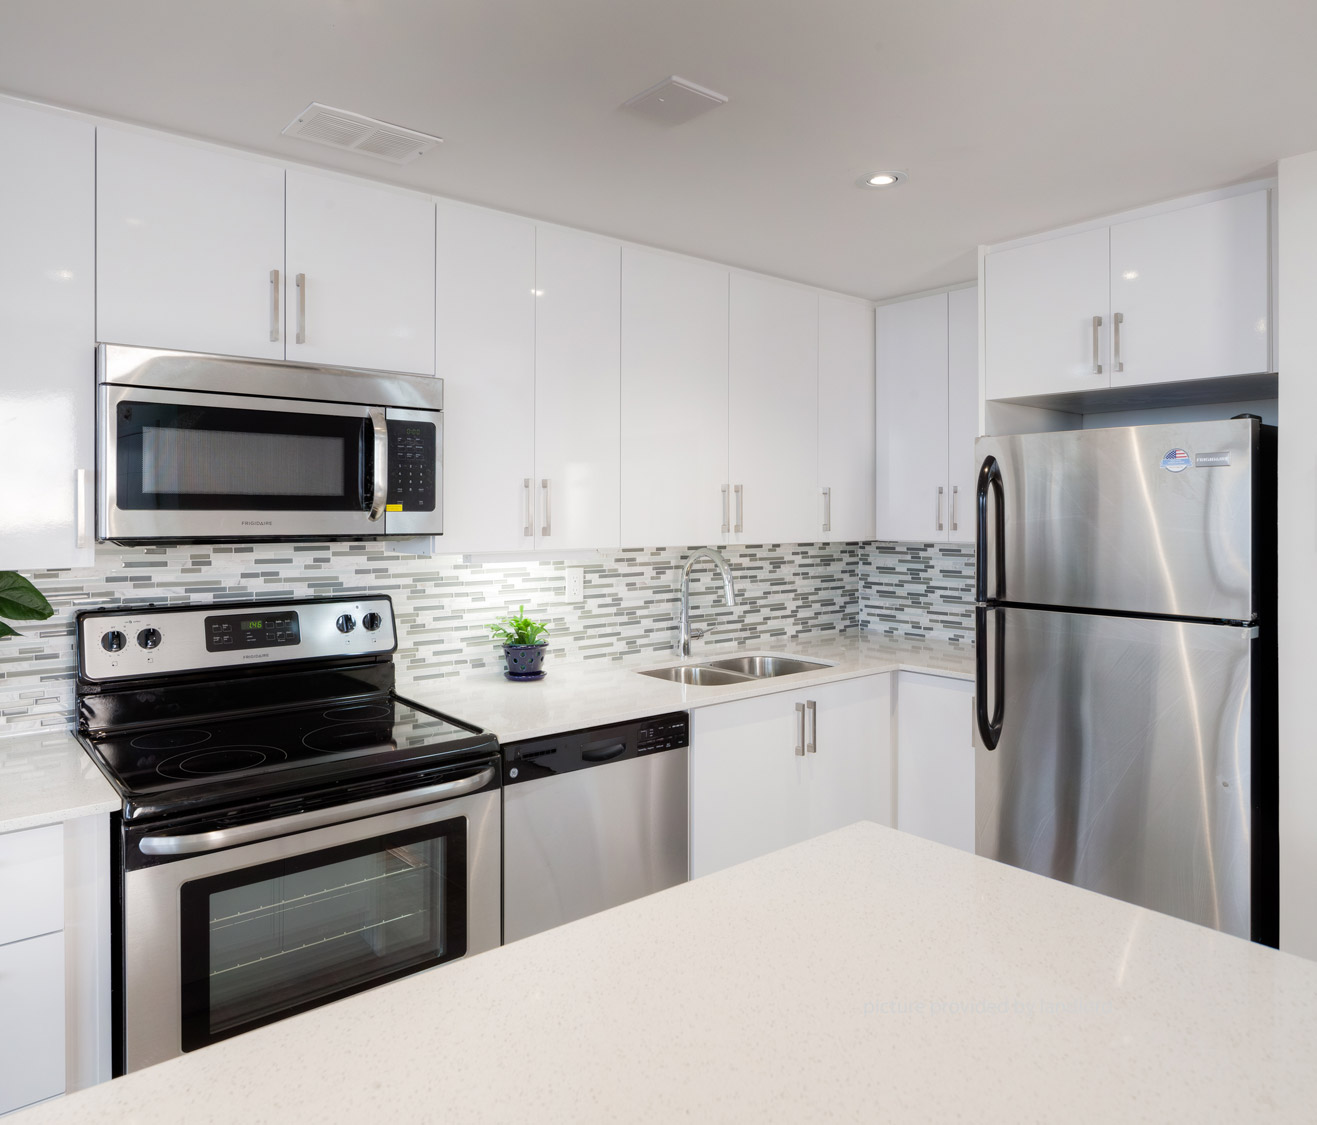 Apartments For Rent Toronto: 45 Balliol St, TORONTO , ON : 1 Bedroom For Rent